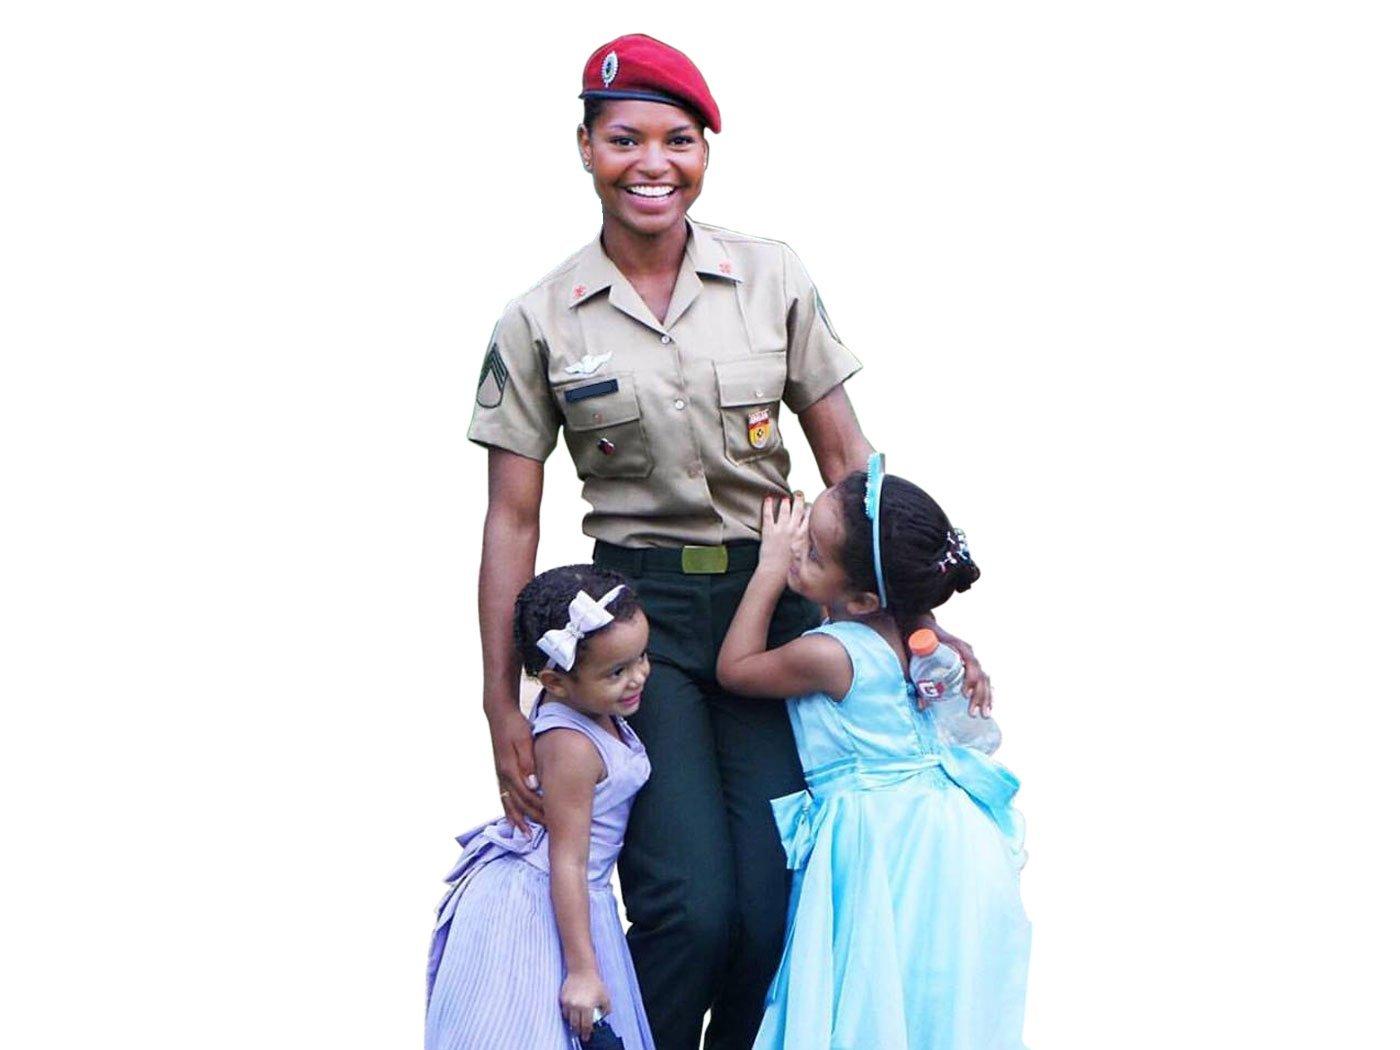 Progressive Police Recruiting - Police Training Webinars